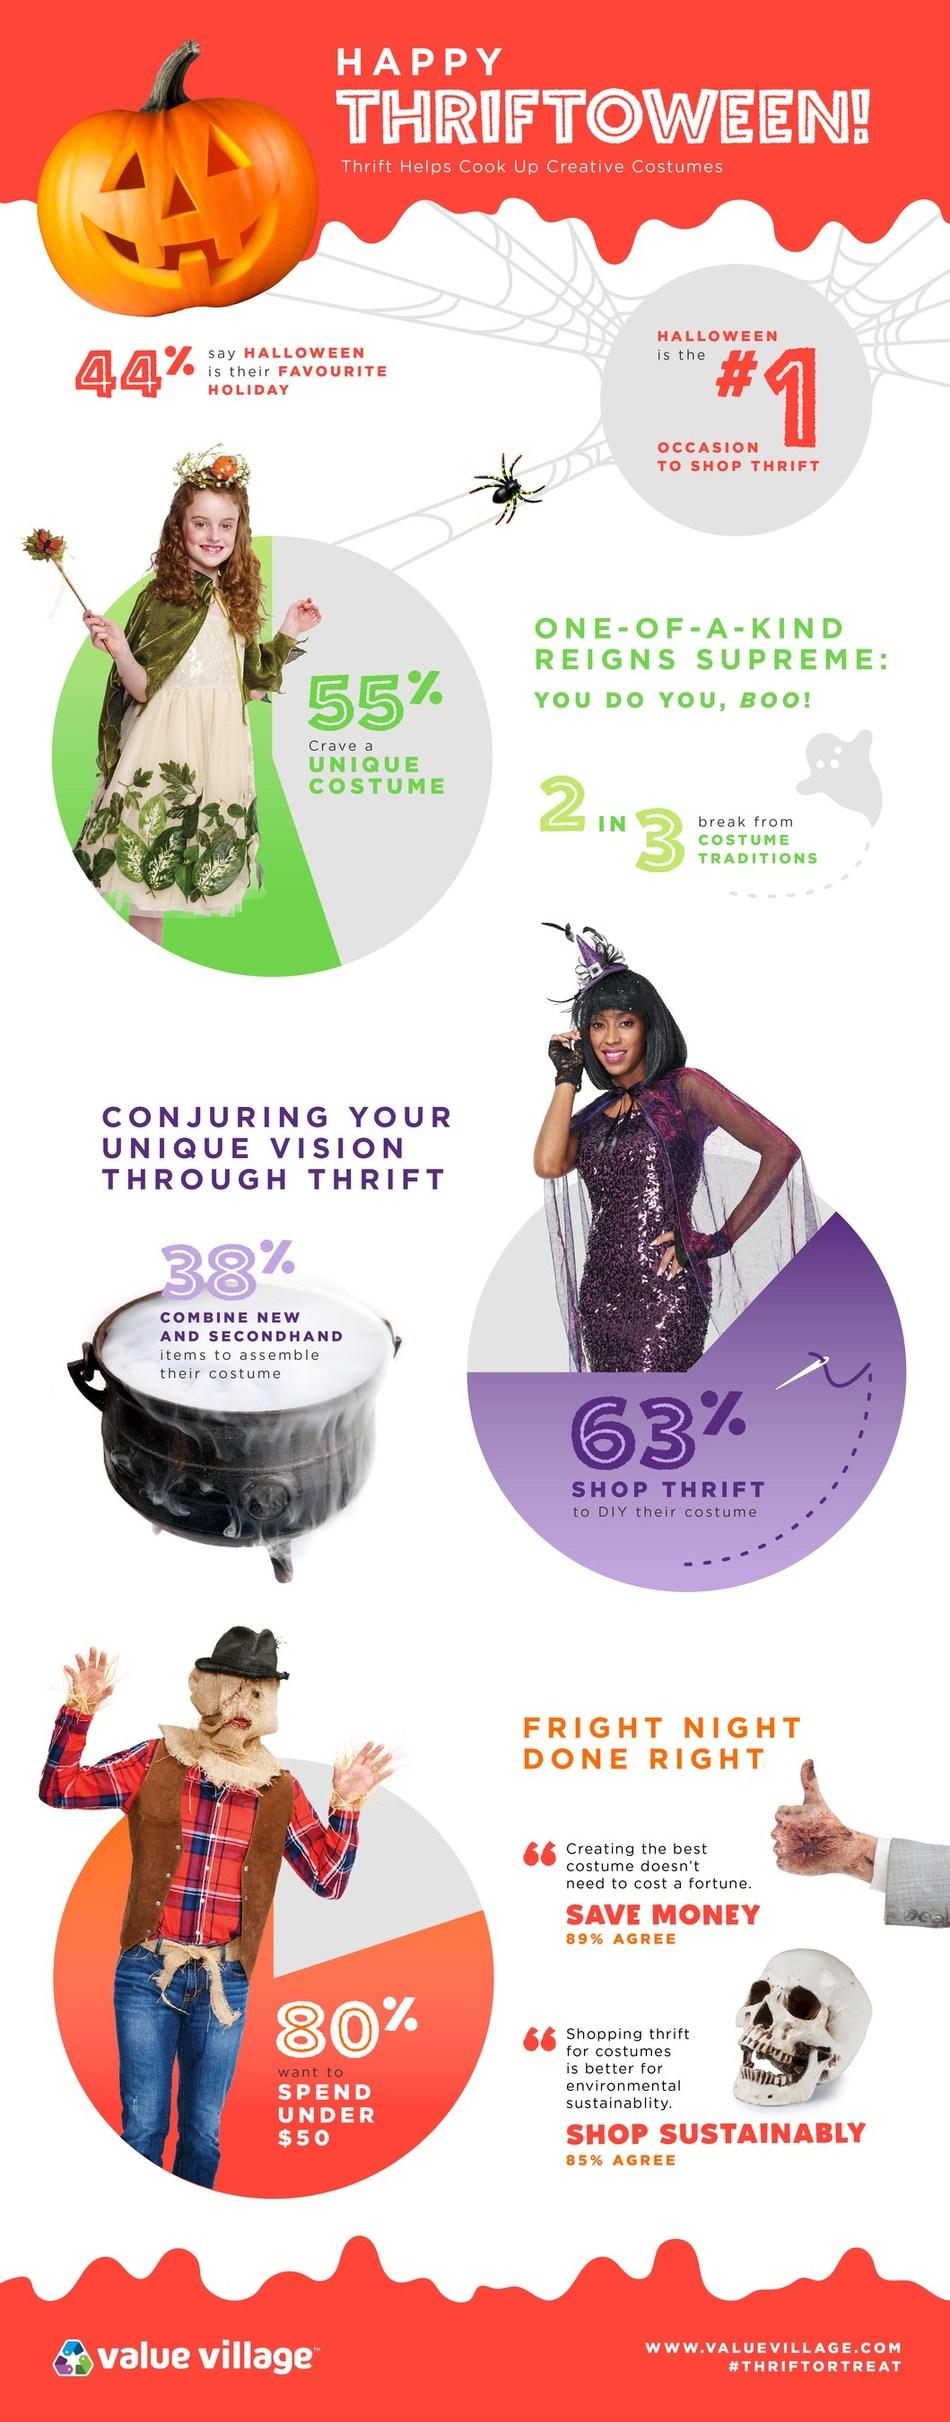 Value Village Halloween Survey Infographic 2018